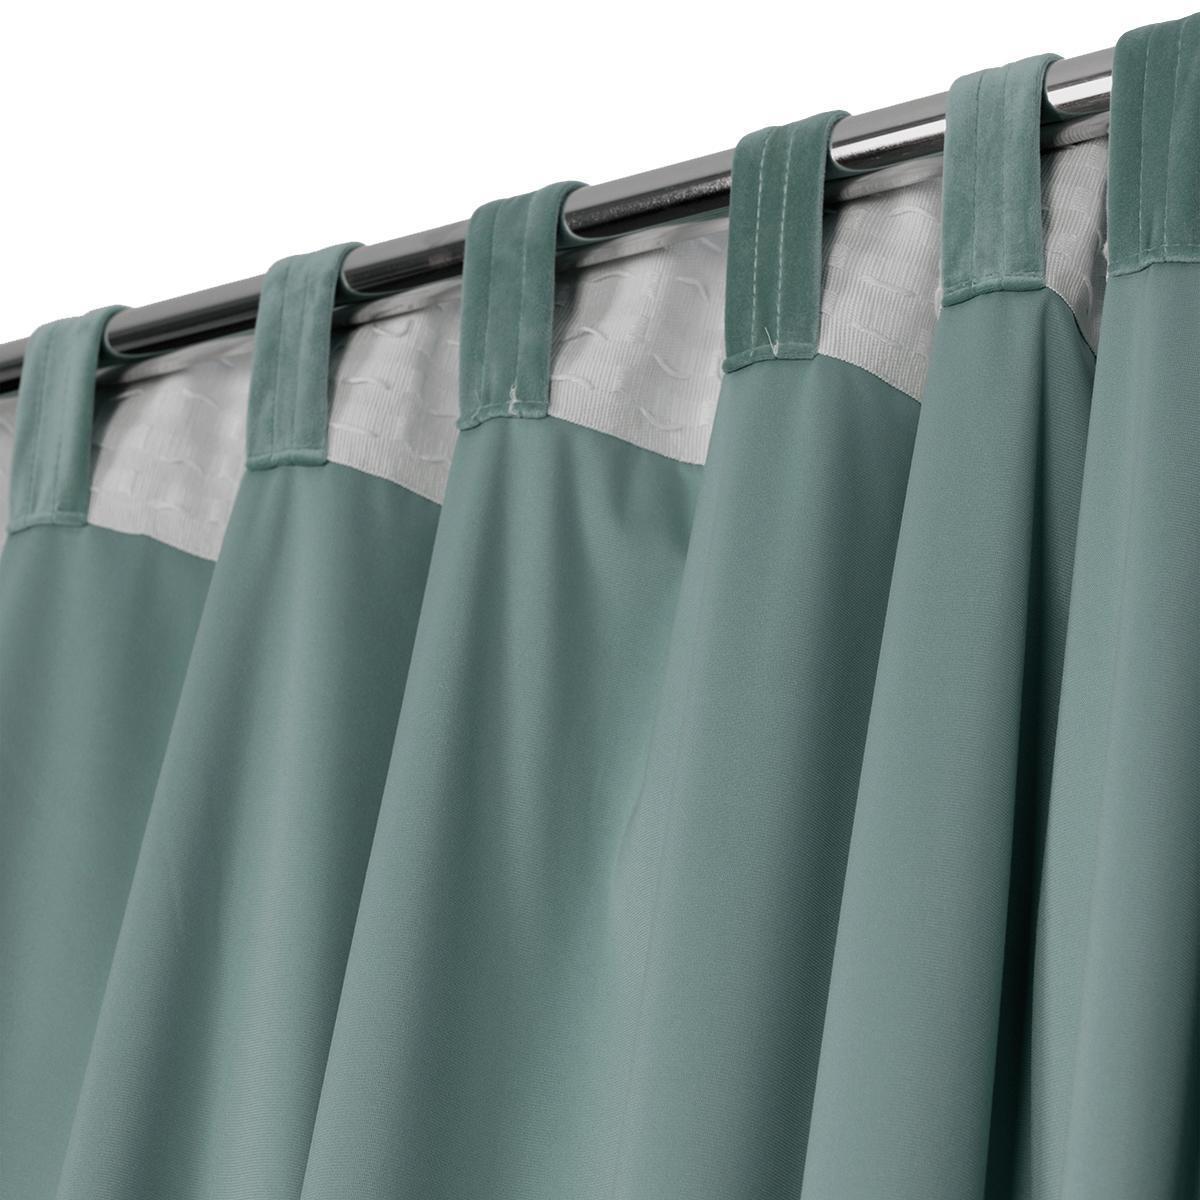 Tenda Misty verde passanti nascosti 135 x 280 cm - 2